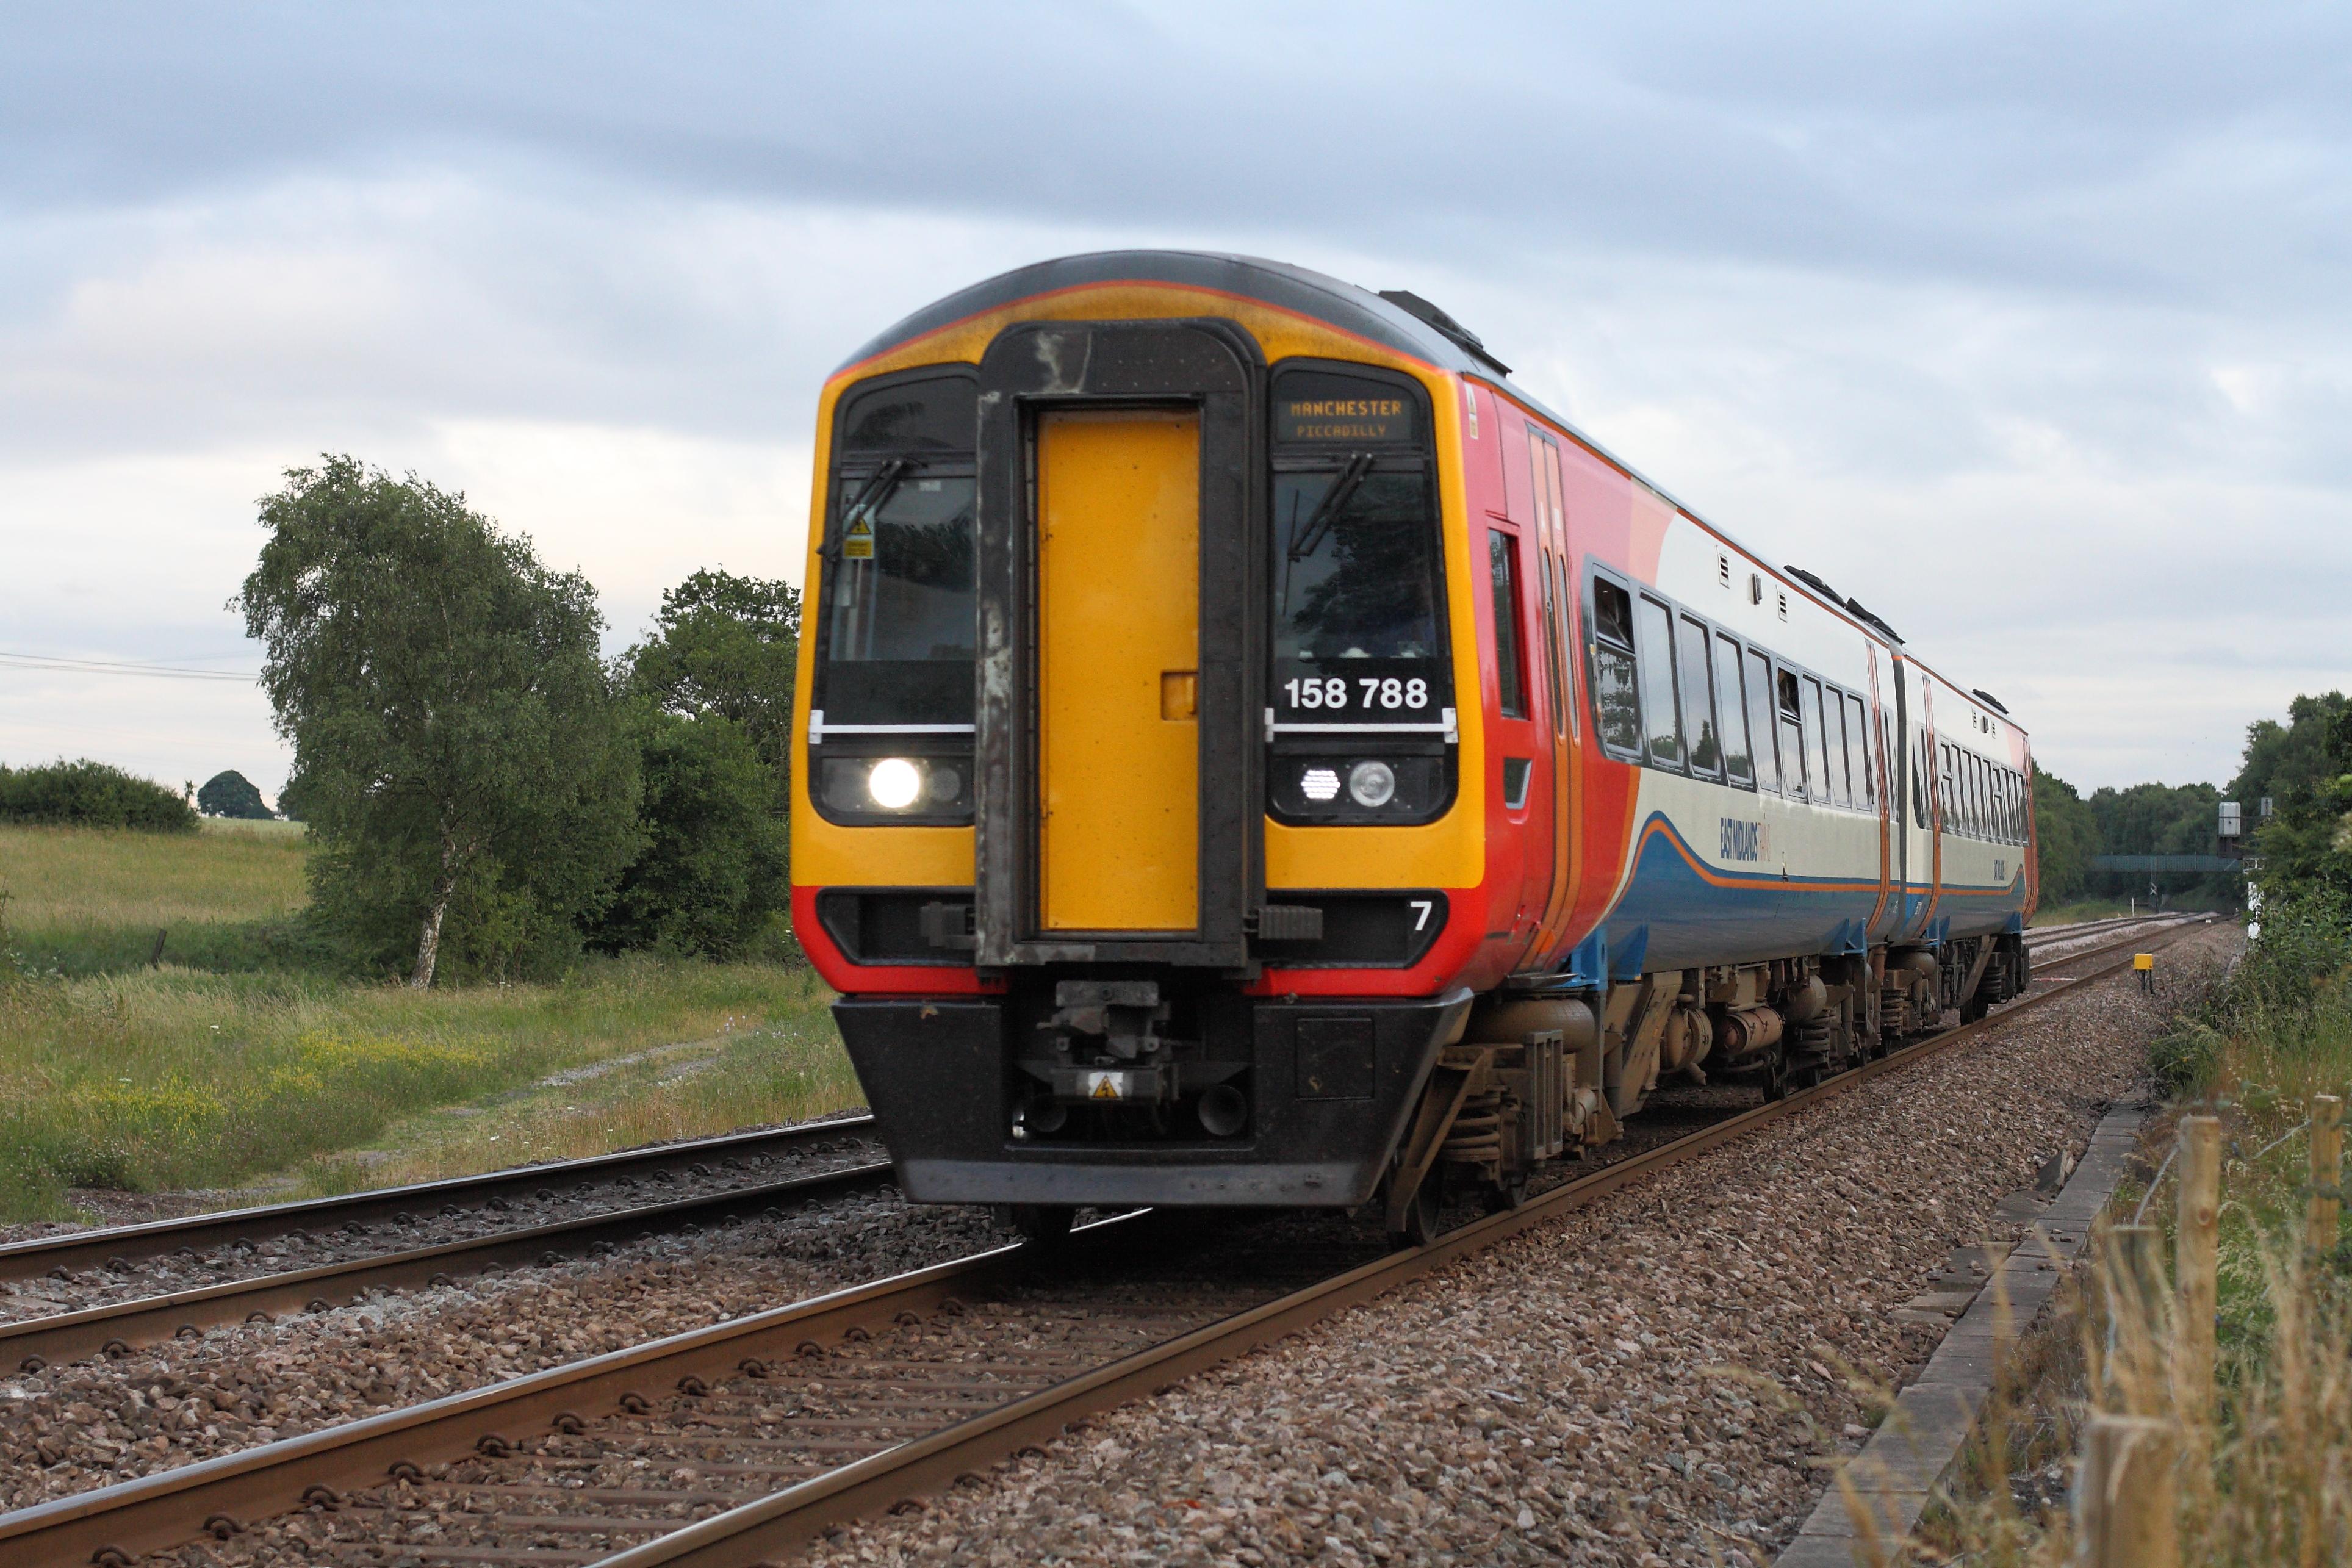 British Rail Class 158 Express Sprinter